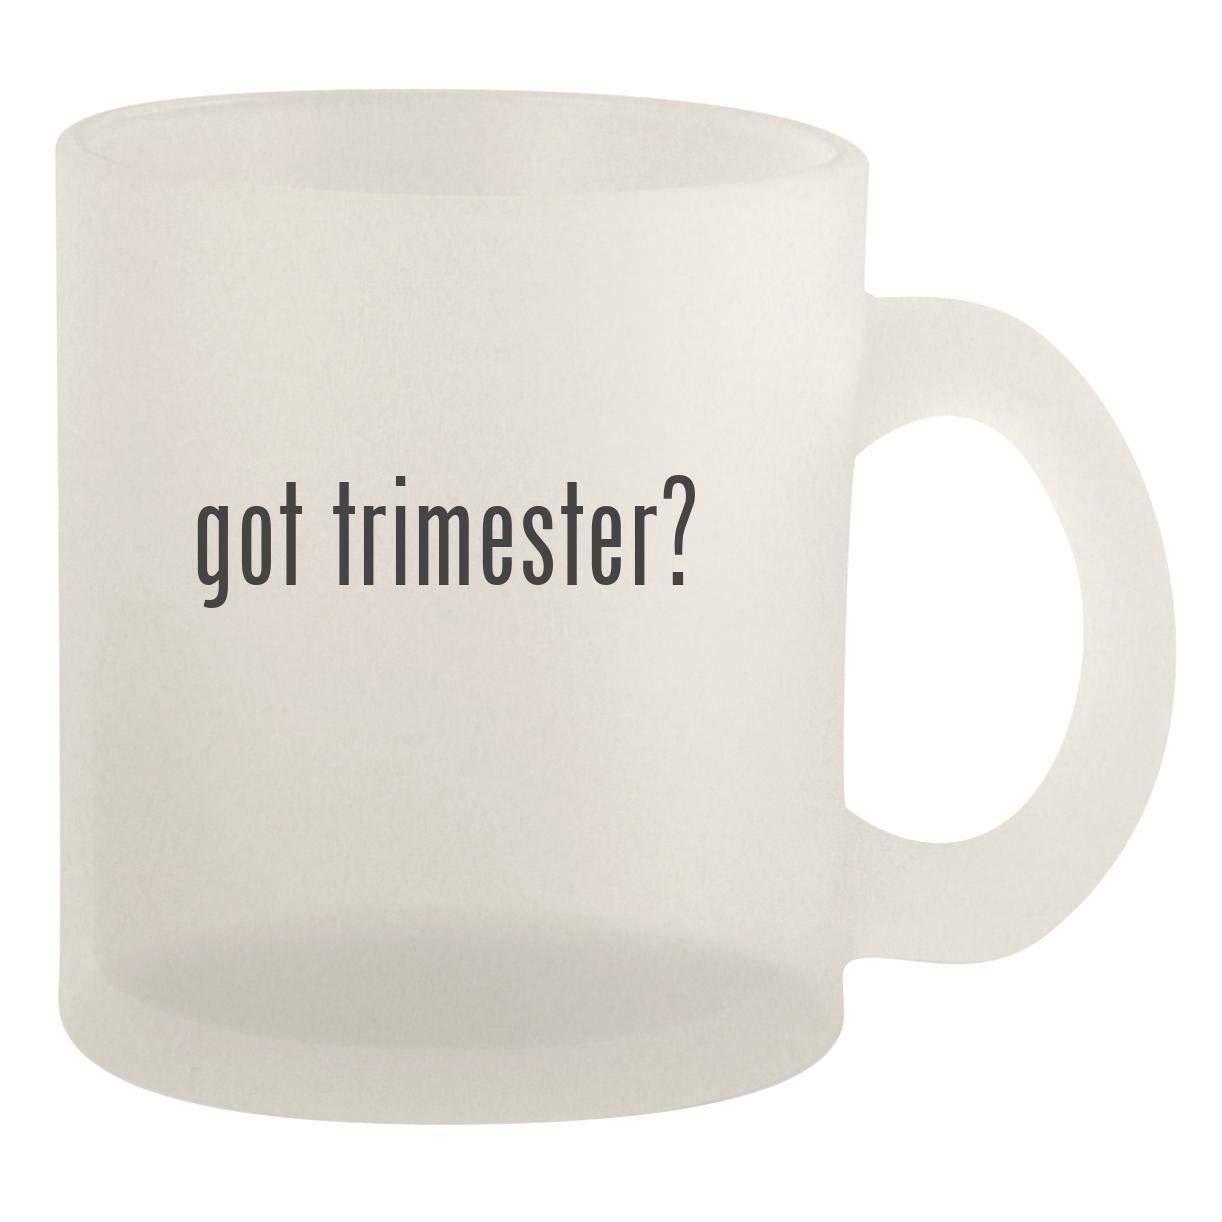 got trimester? - Glass 10oz Frosted Coffee Mug